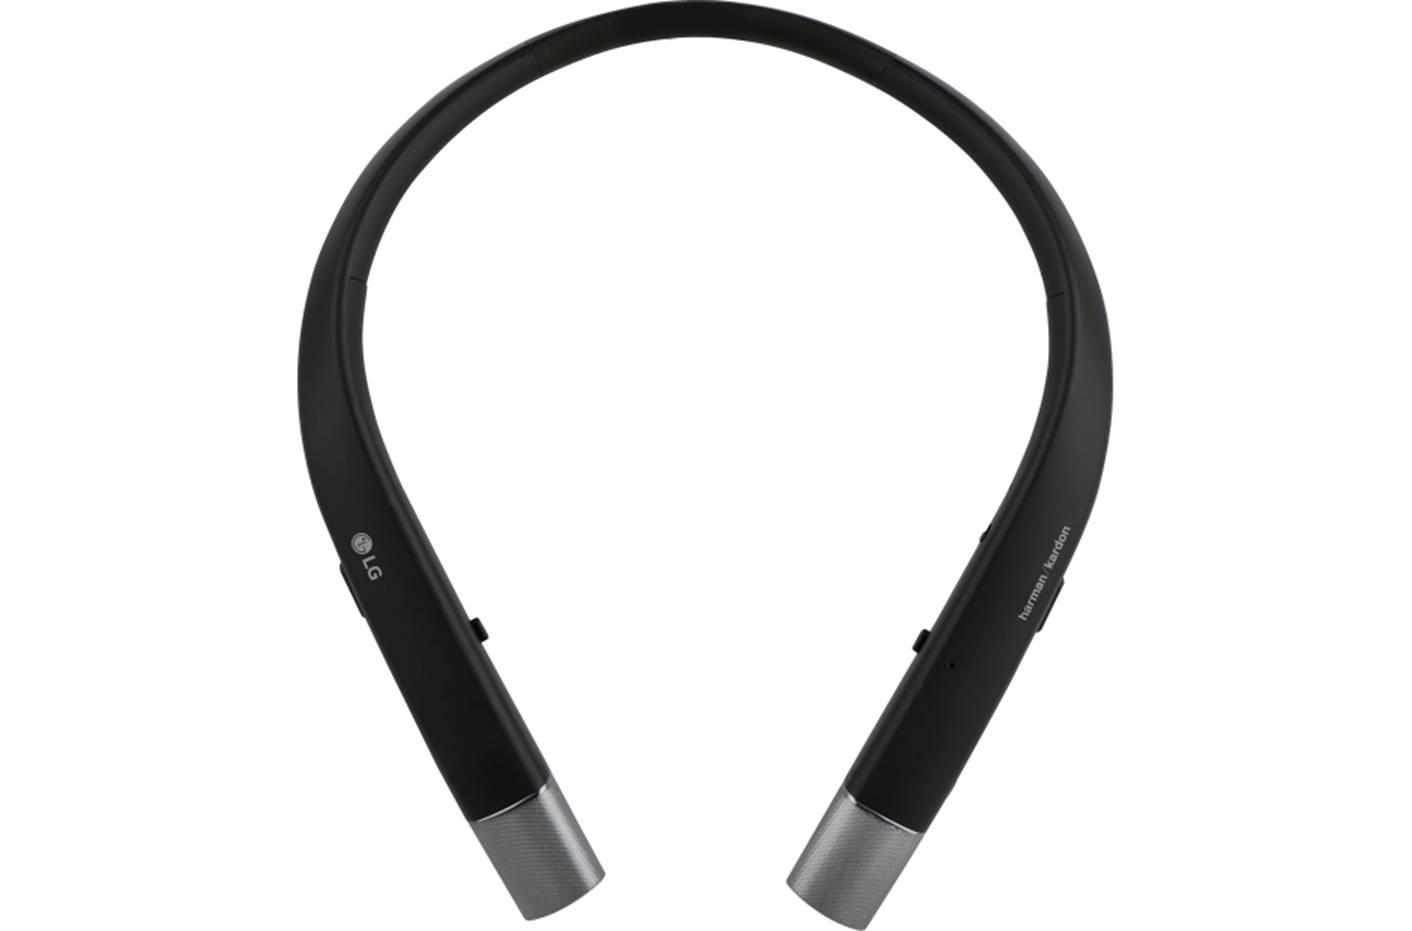 LG Tone Infinim HBS-920 Bluetooth Headset